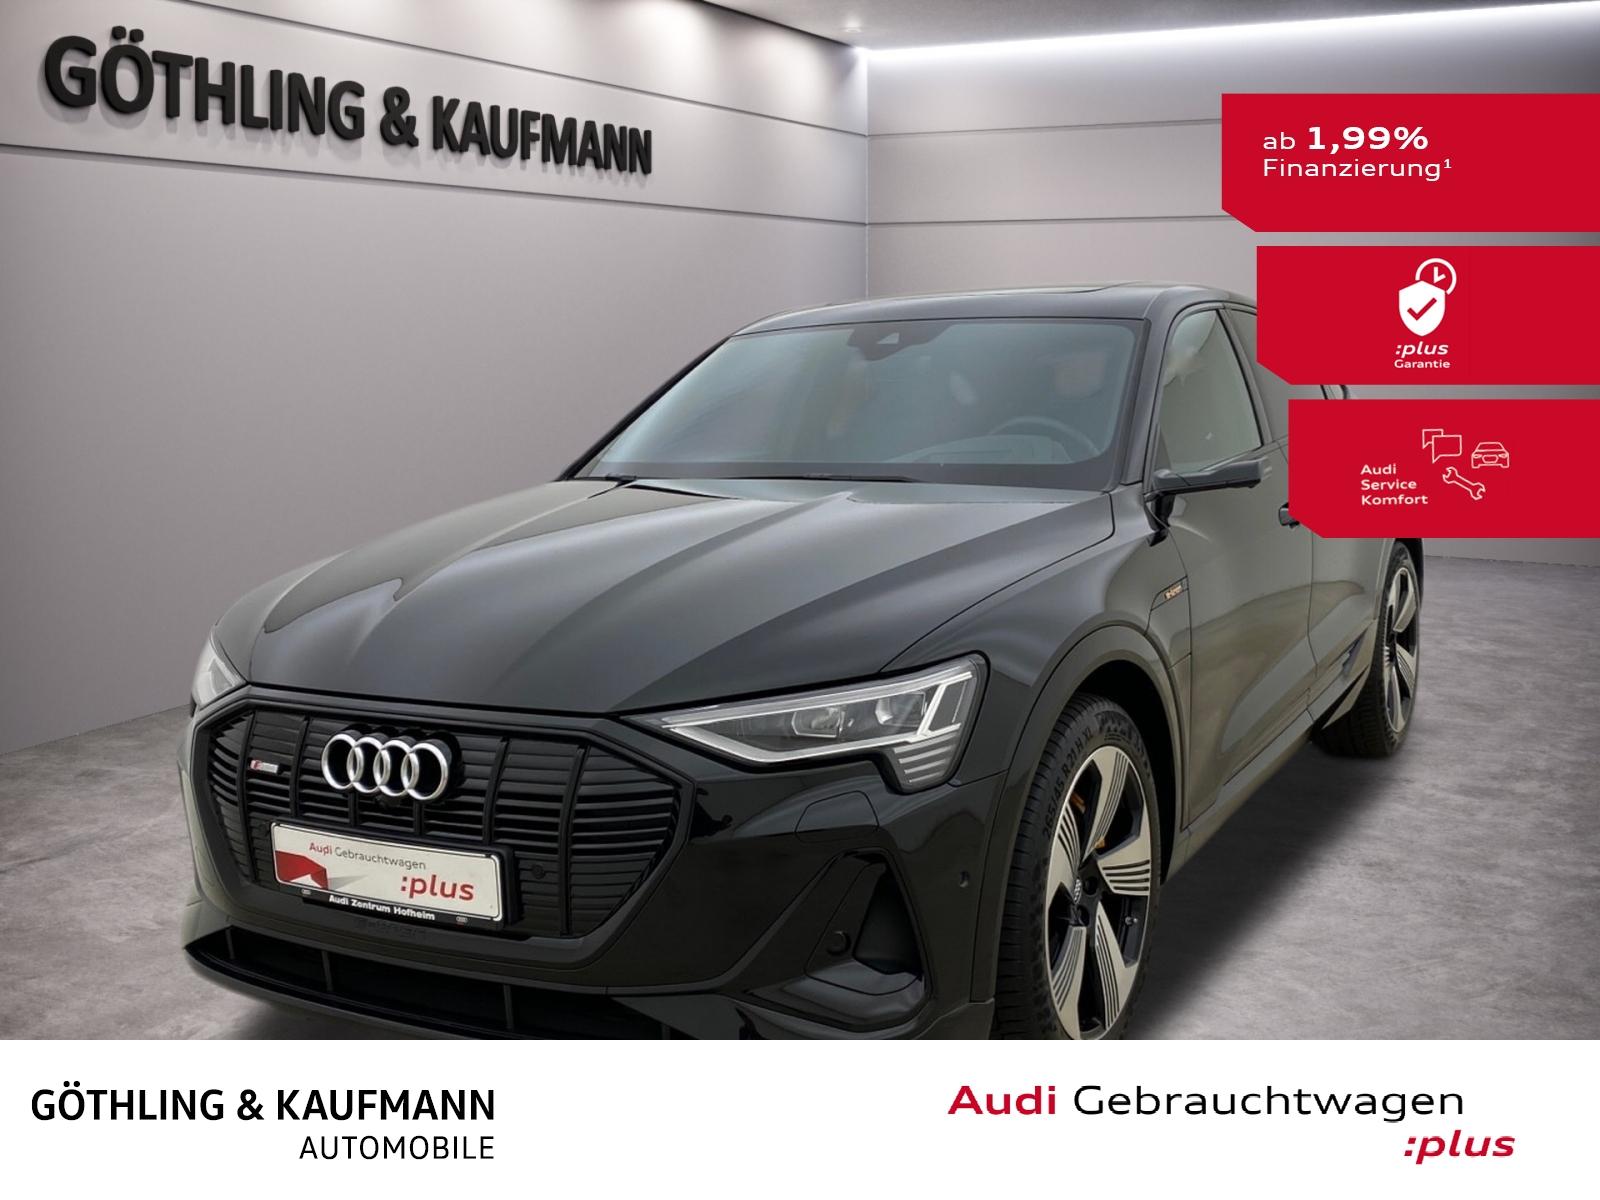 Audi e-tron Sportback 55 S line qu. EUPE 114925*SSitz, Jahr 2020, Elektro